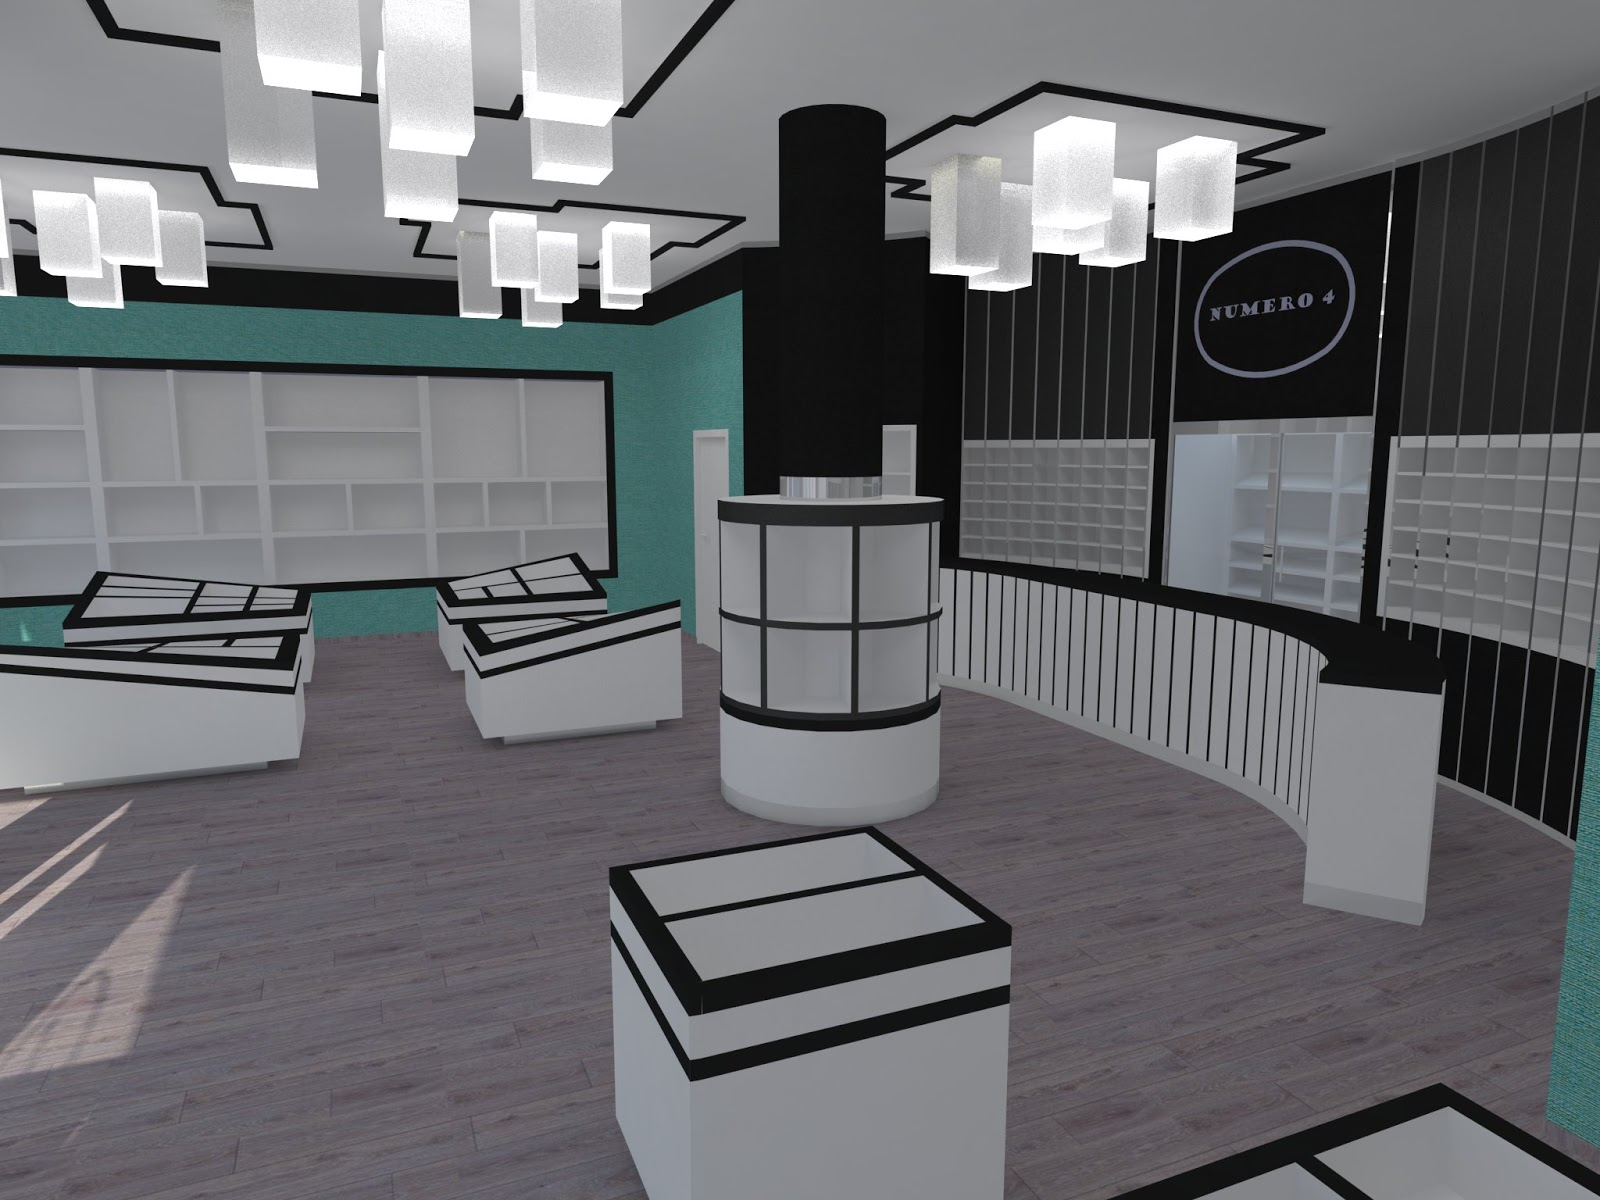 Dise o de interiores escuela de arte de motril proyectos for Ciclo superior diseno de interiores